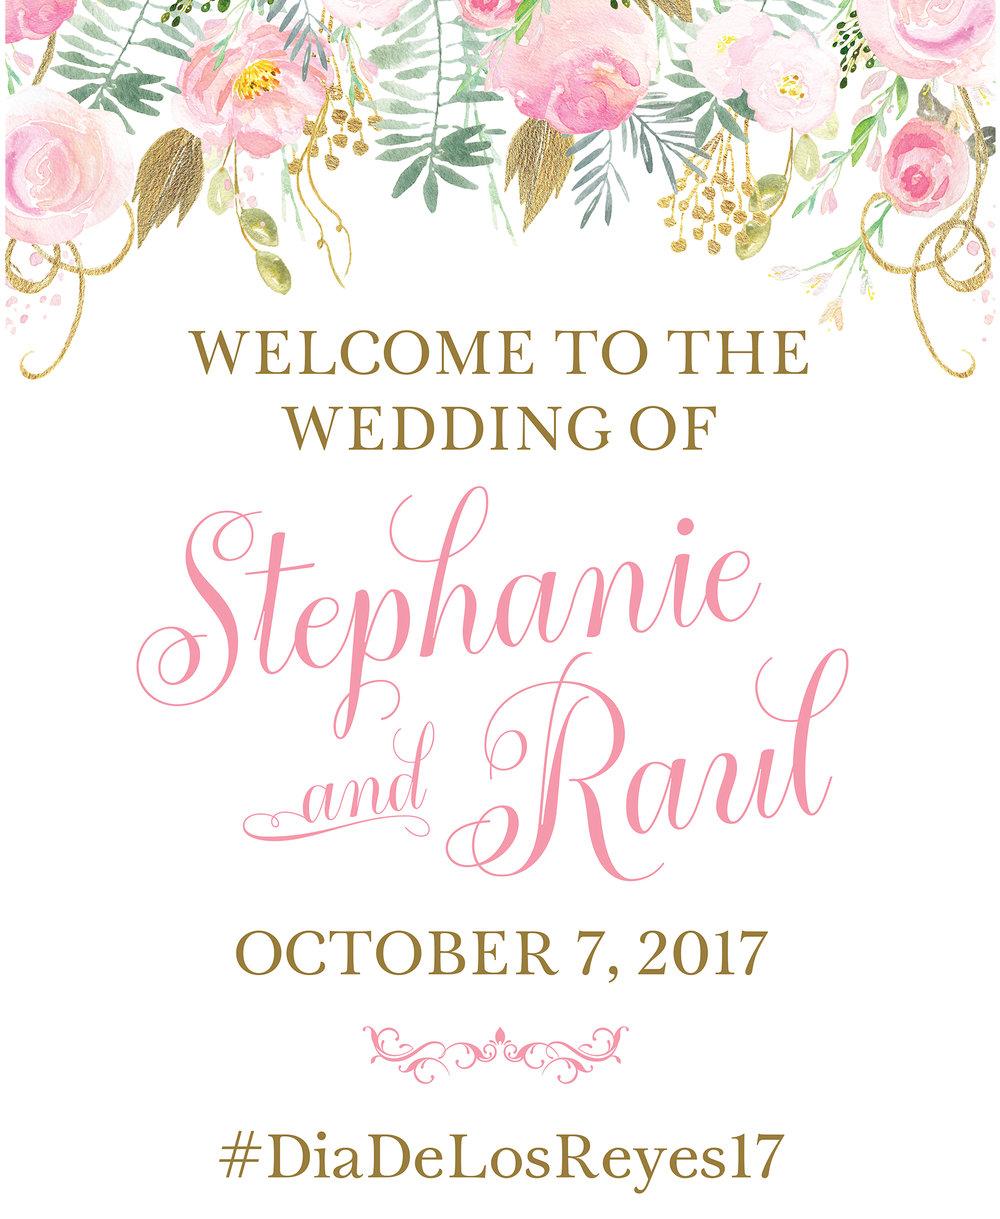 Welcome Sign_Stephanie.jpg